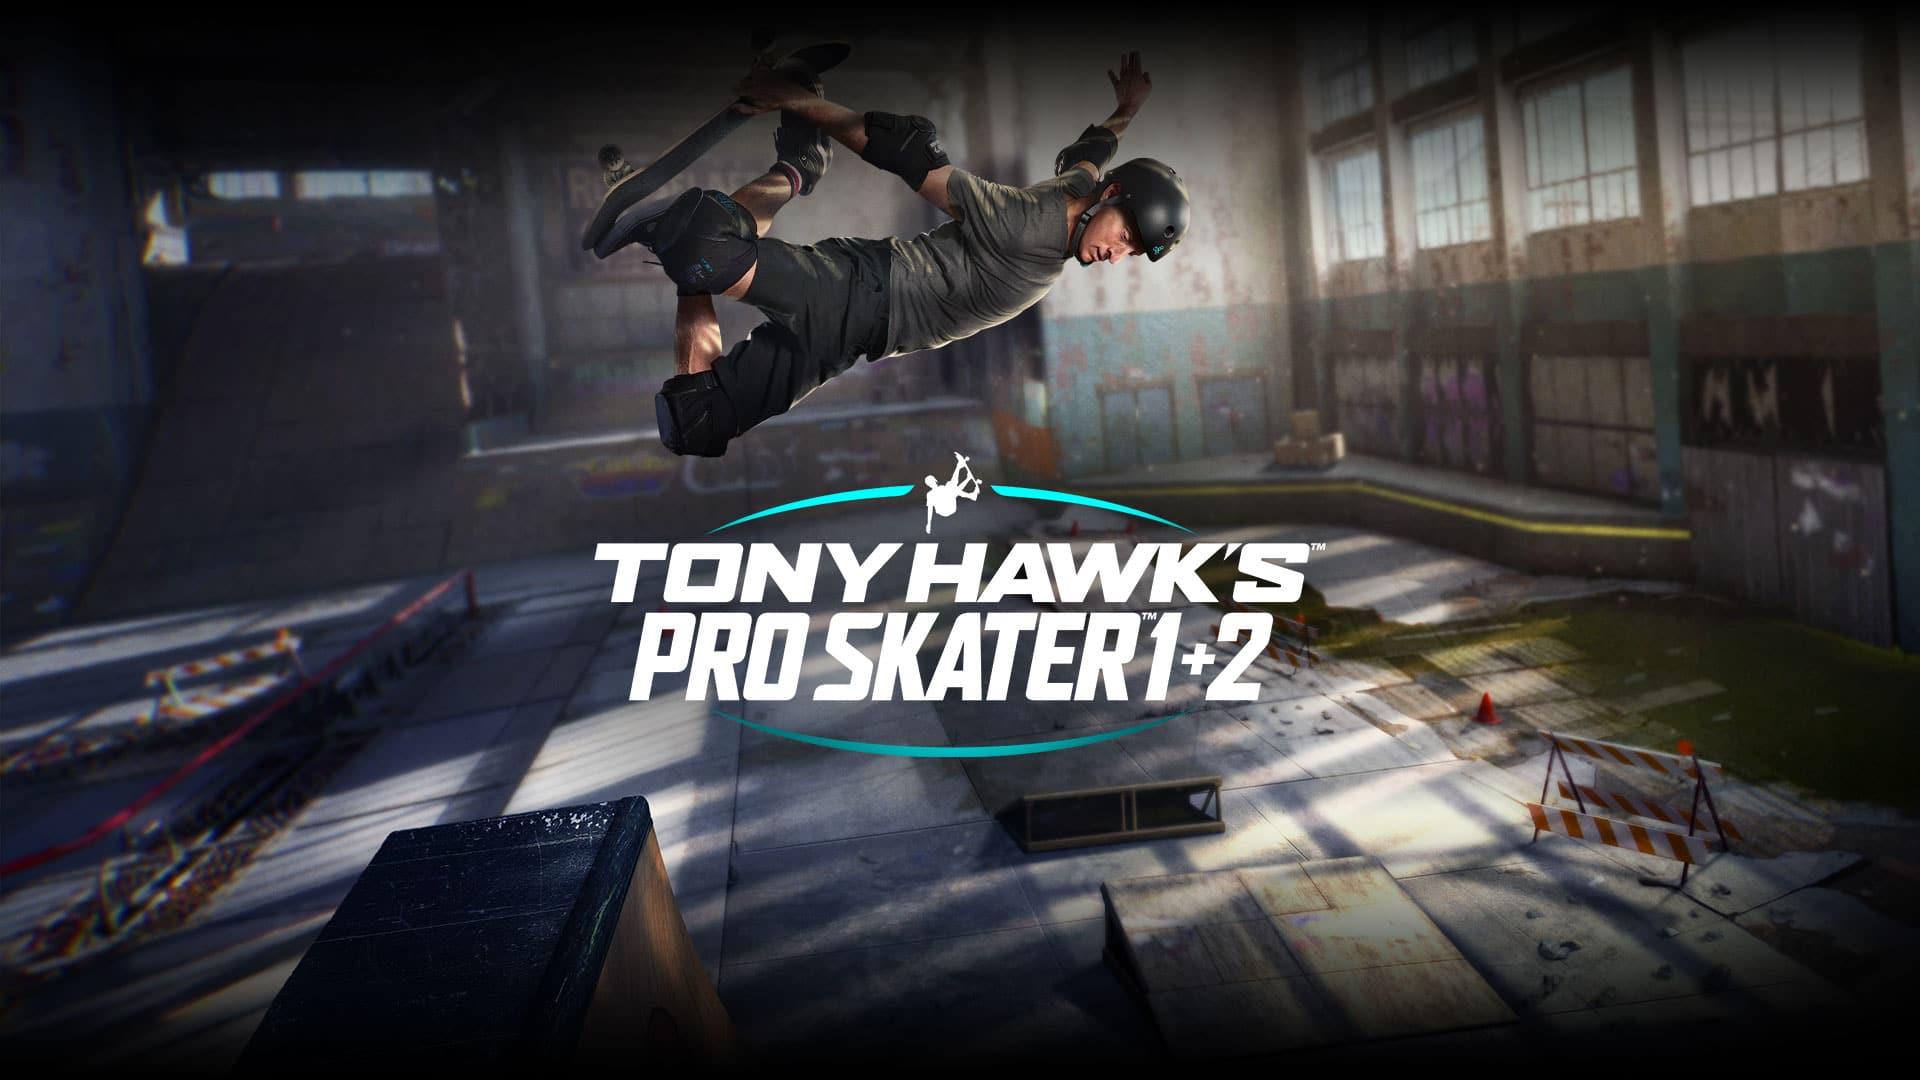 Tony Hawk's Pro Skater 1+2 Playstation 5 GamePlay